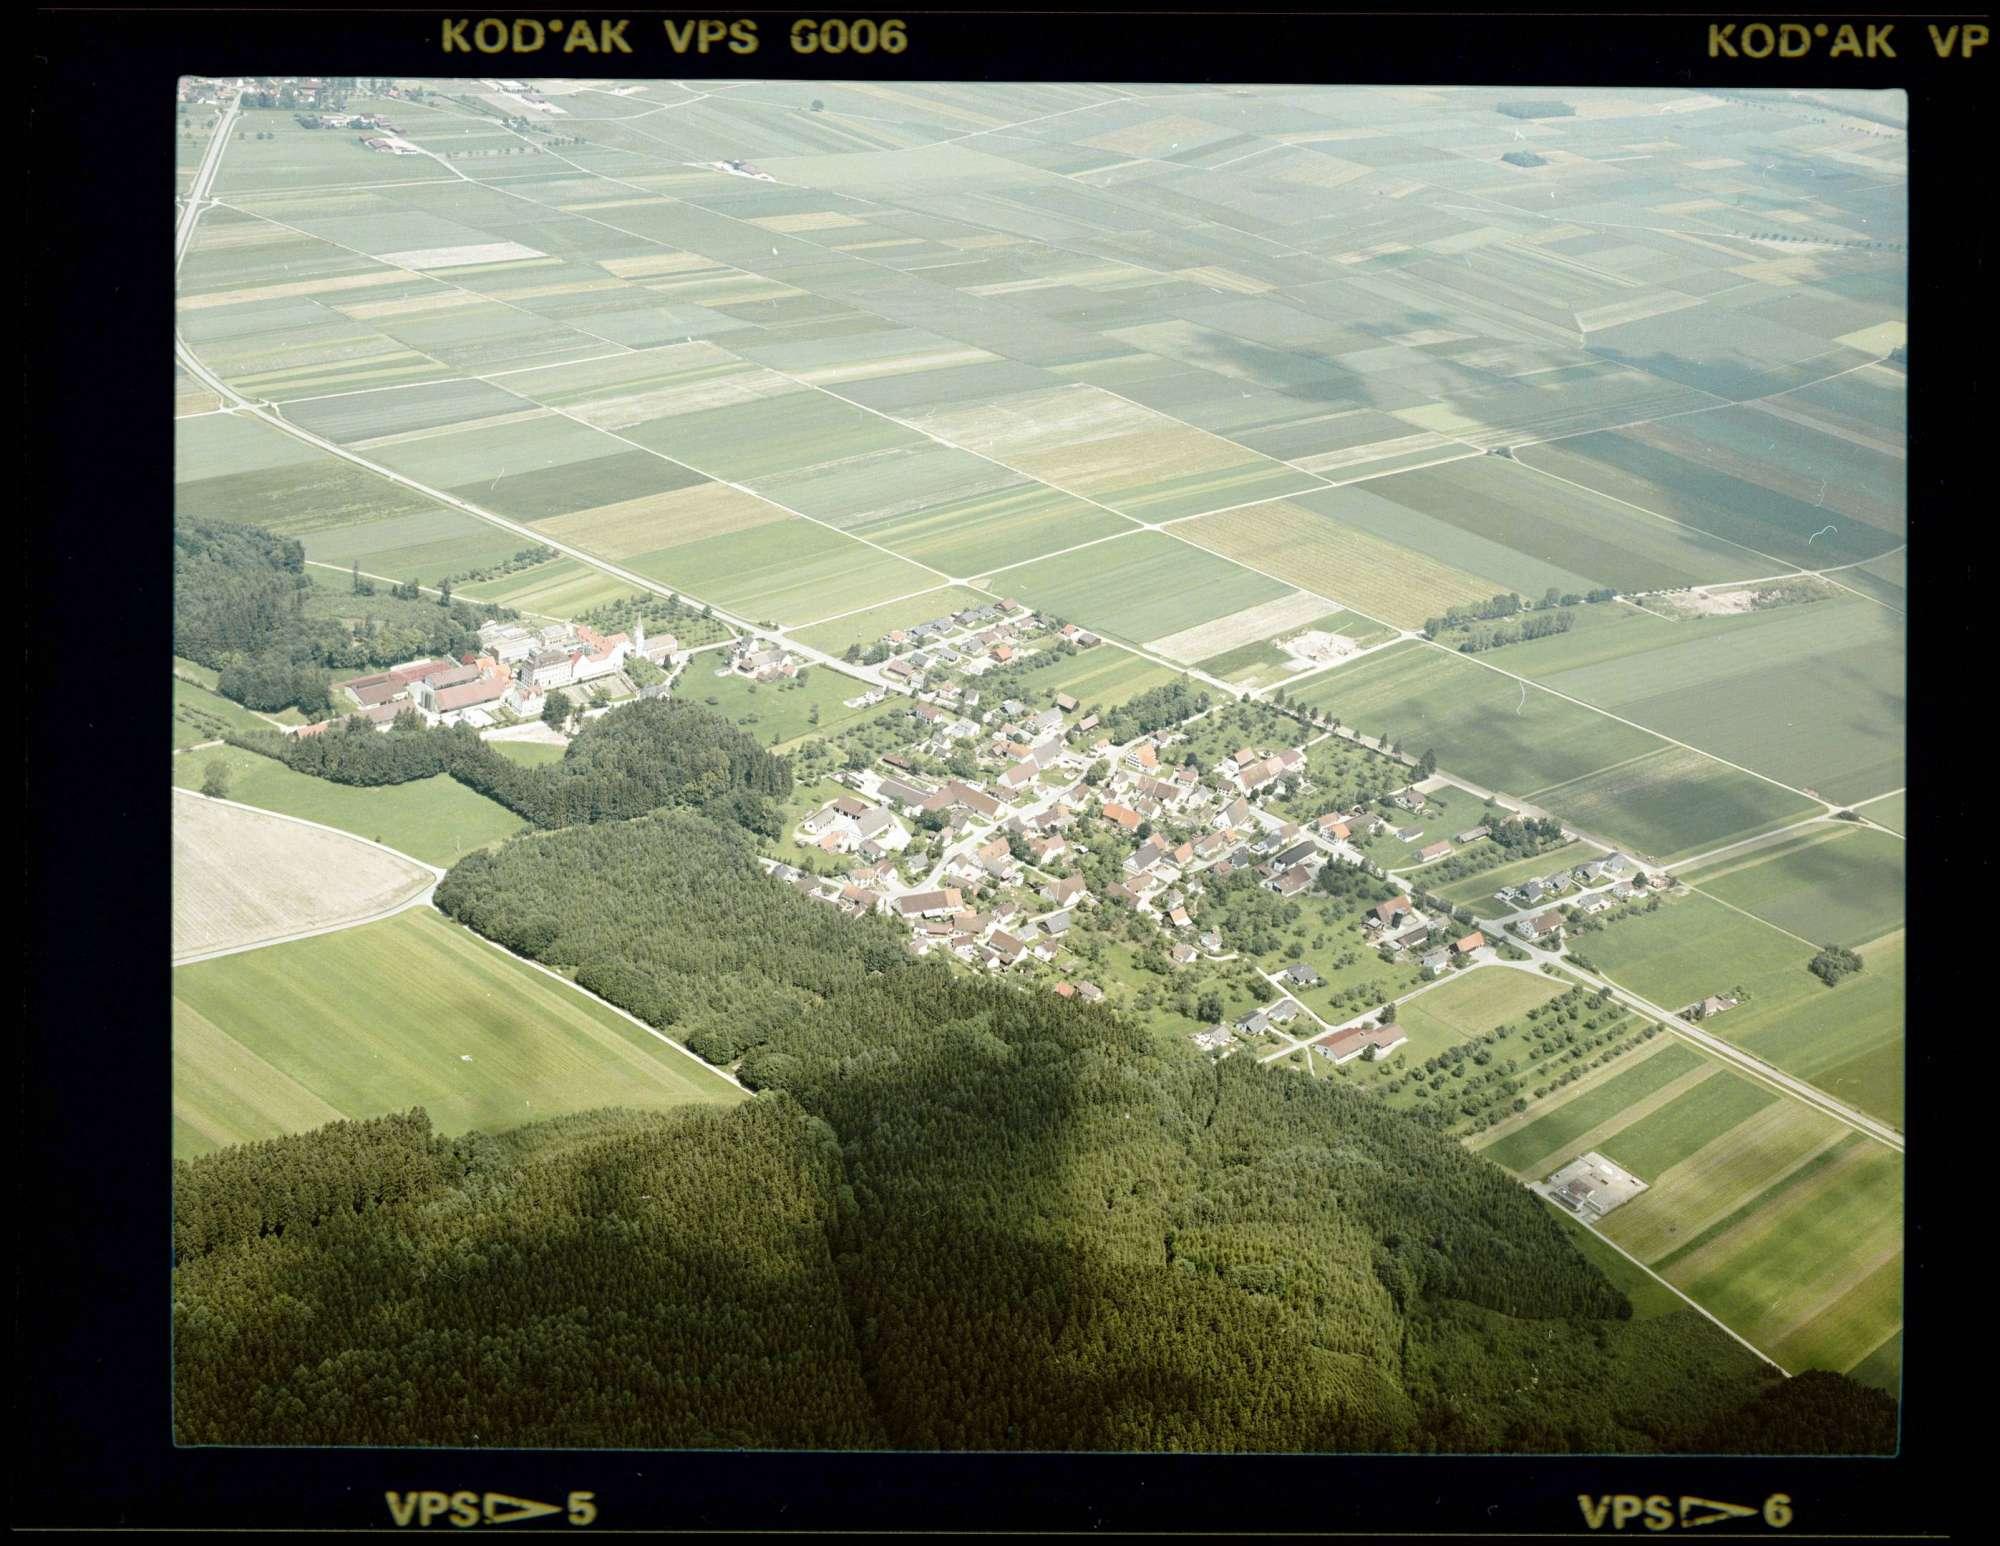 Bonlanden, Luftbild, Bild 1